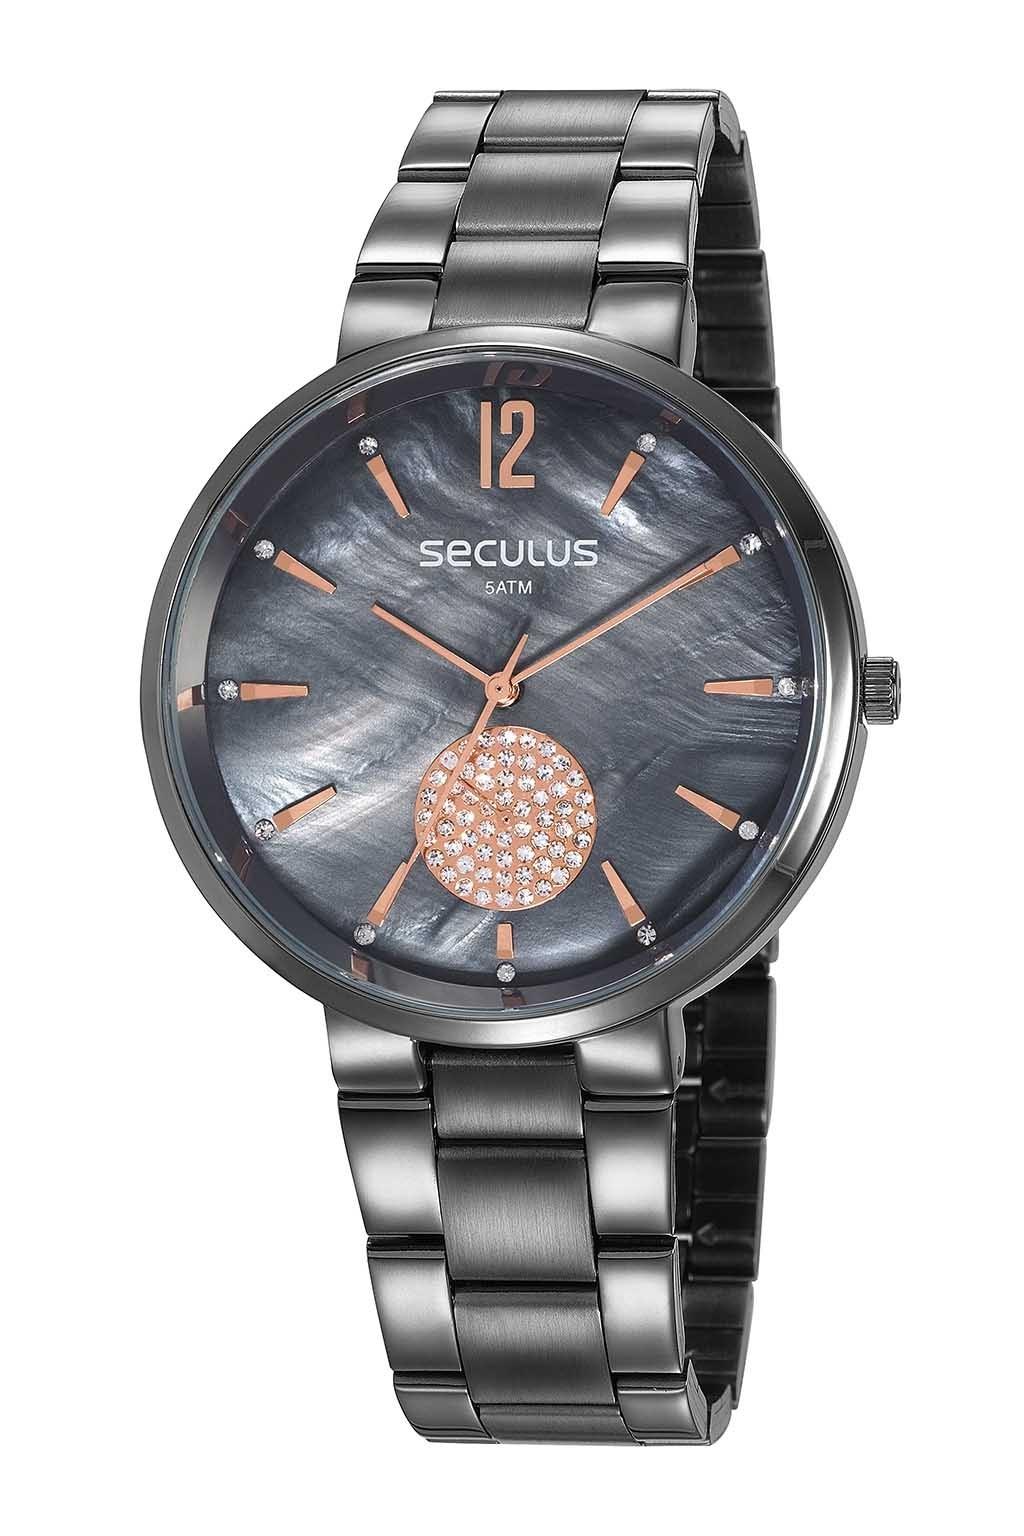 Relógio Feminino Seculus Pulseira de Aço Chumbo Fundo Cinza 77022LPSVSS3